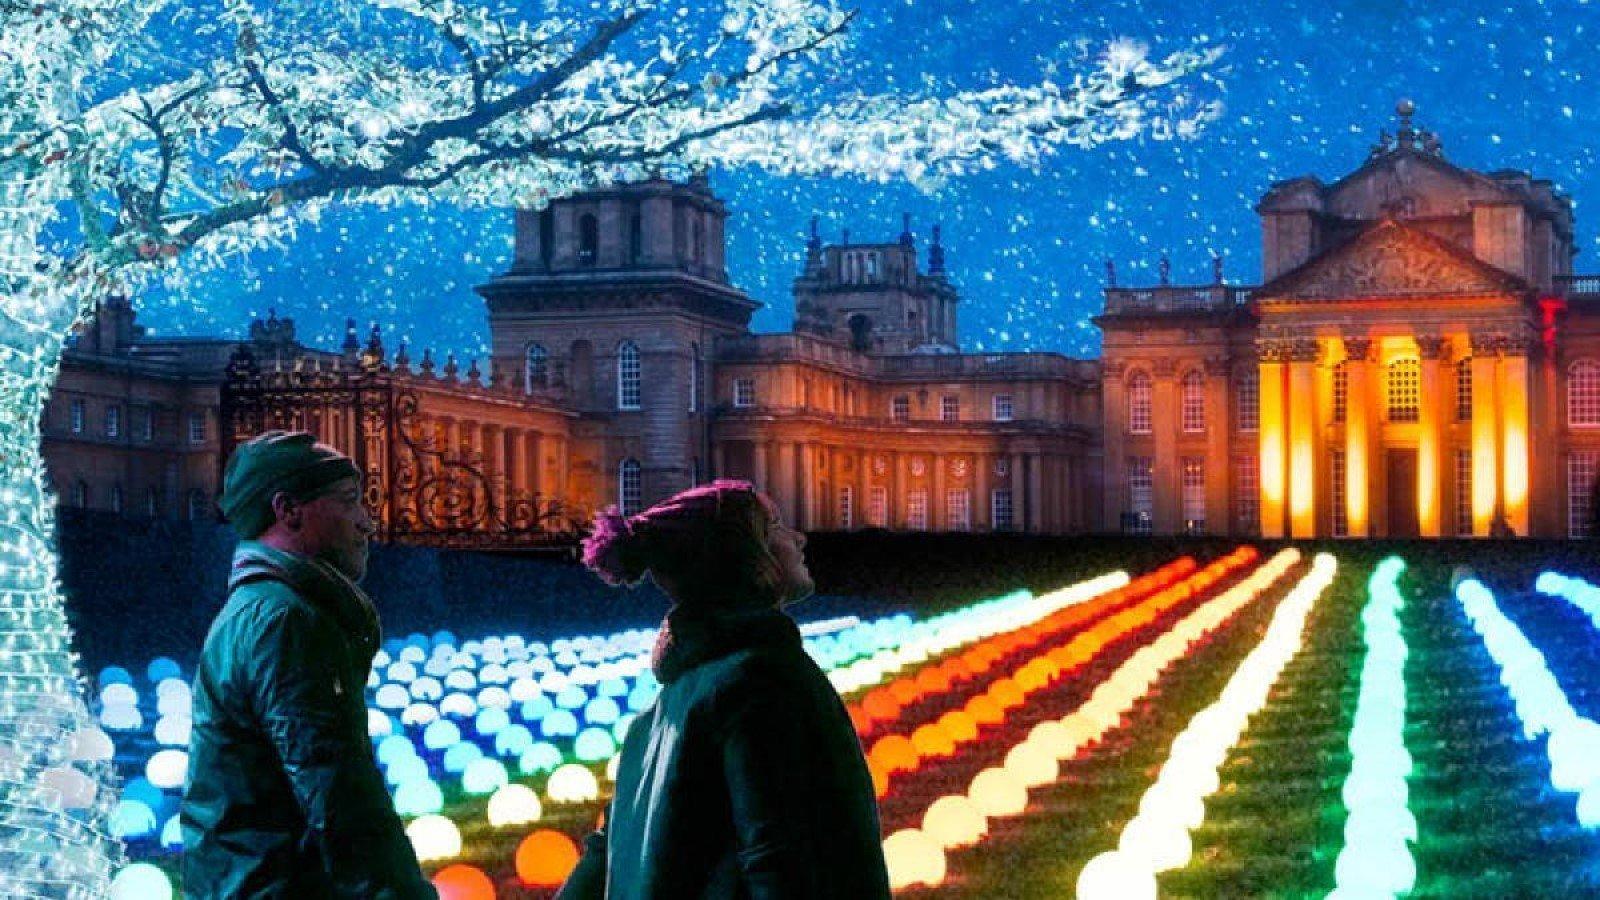 Blenheim Palace Illuminated Light Trail 2020